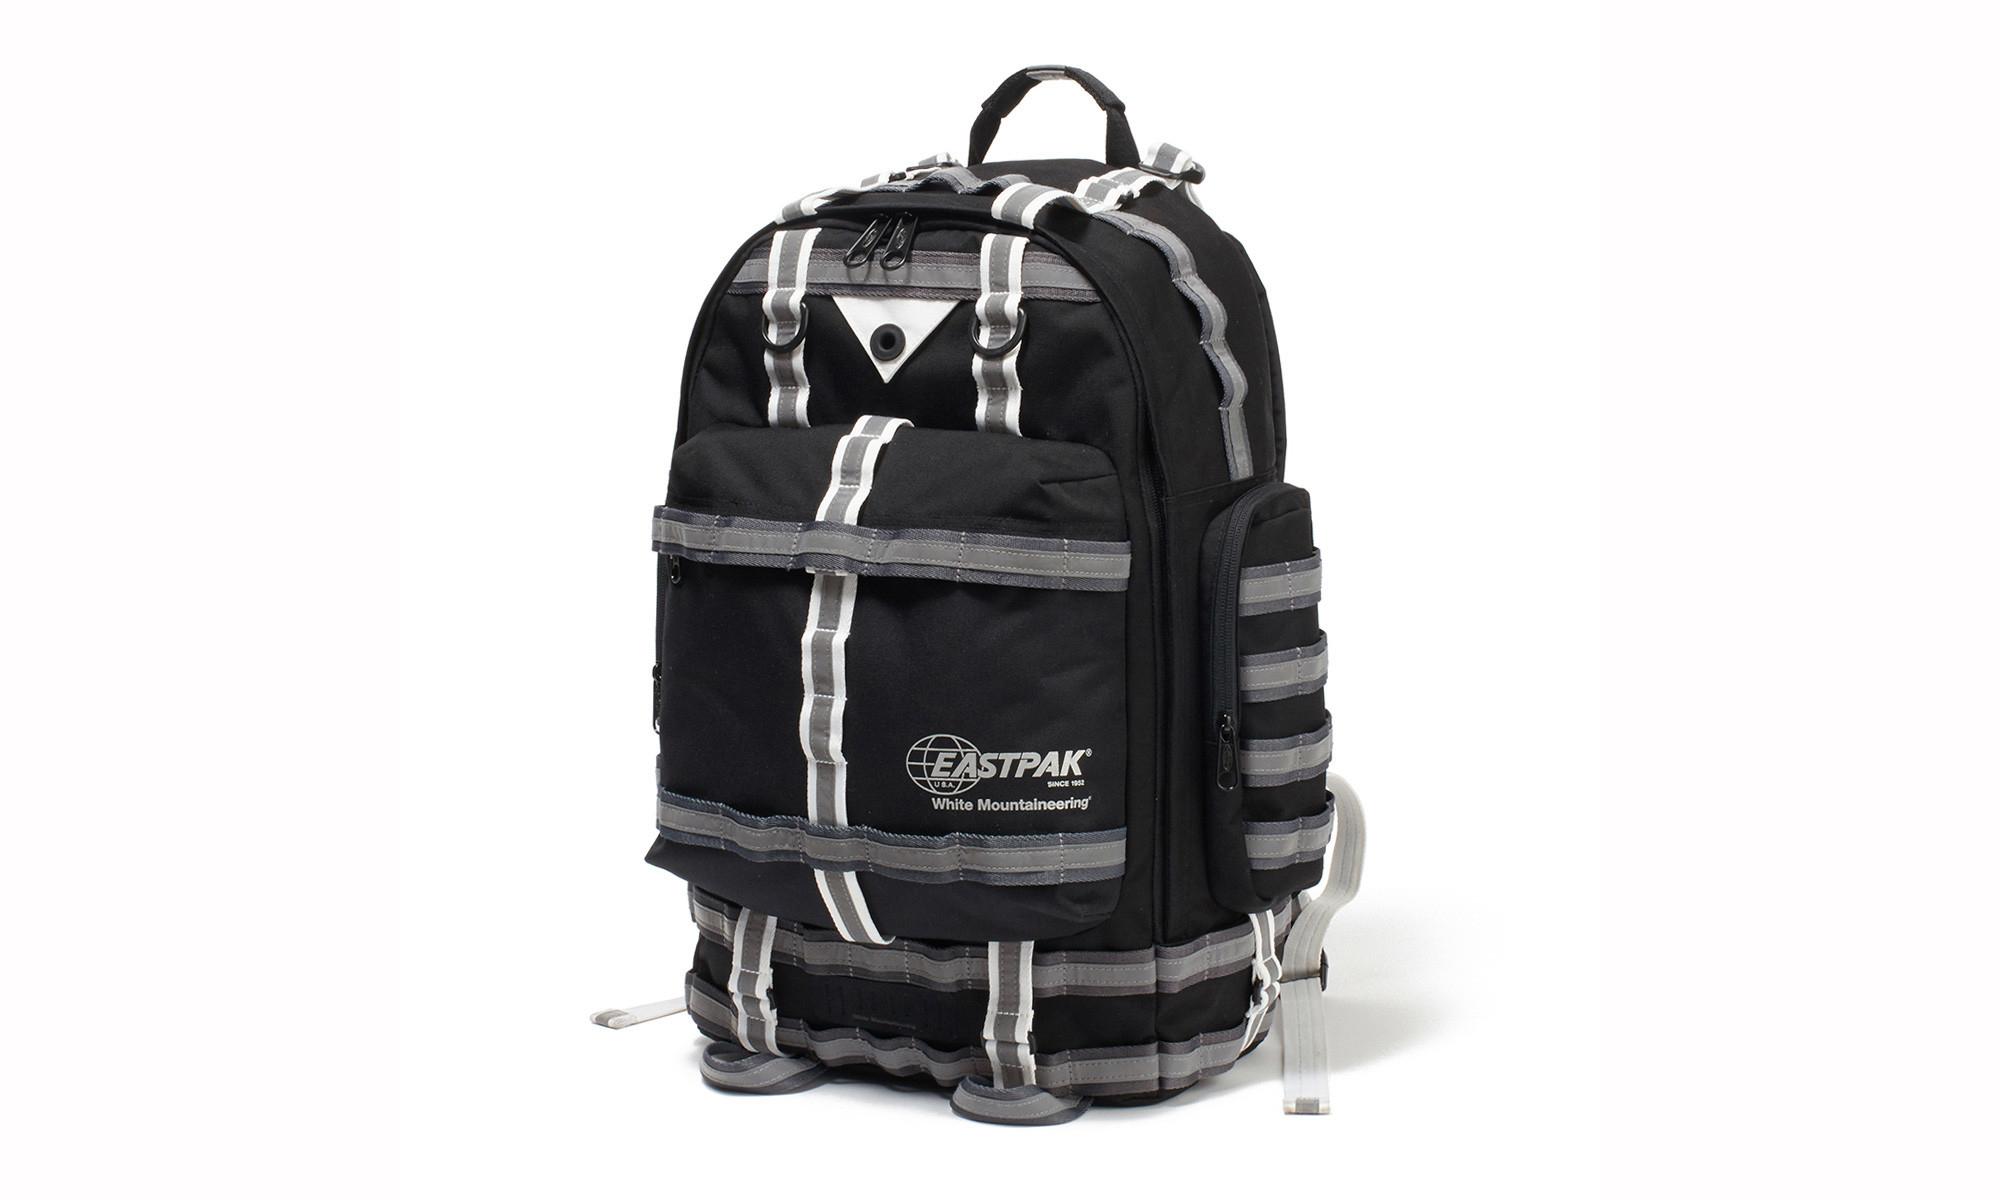 White Mountaineering x EASTPAK 19 春夏联名包袋即将开售